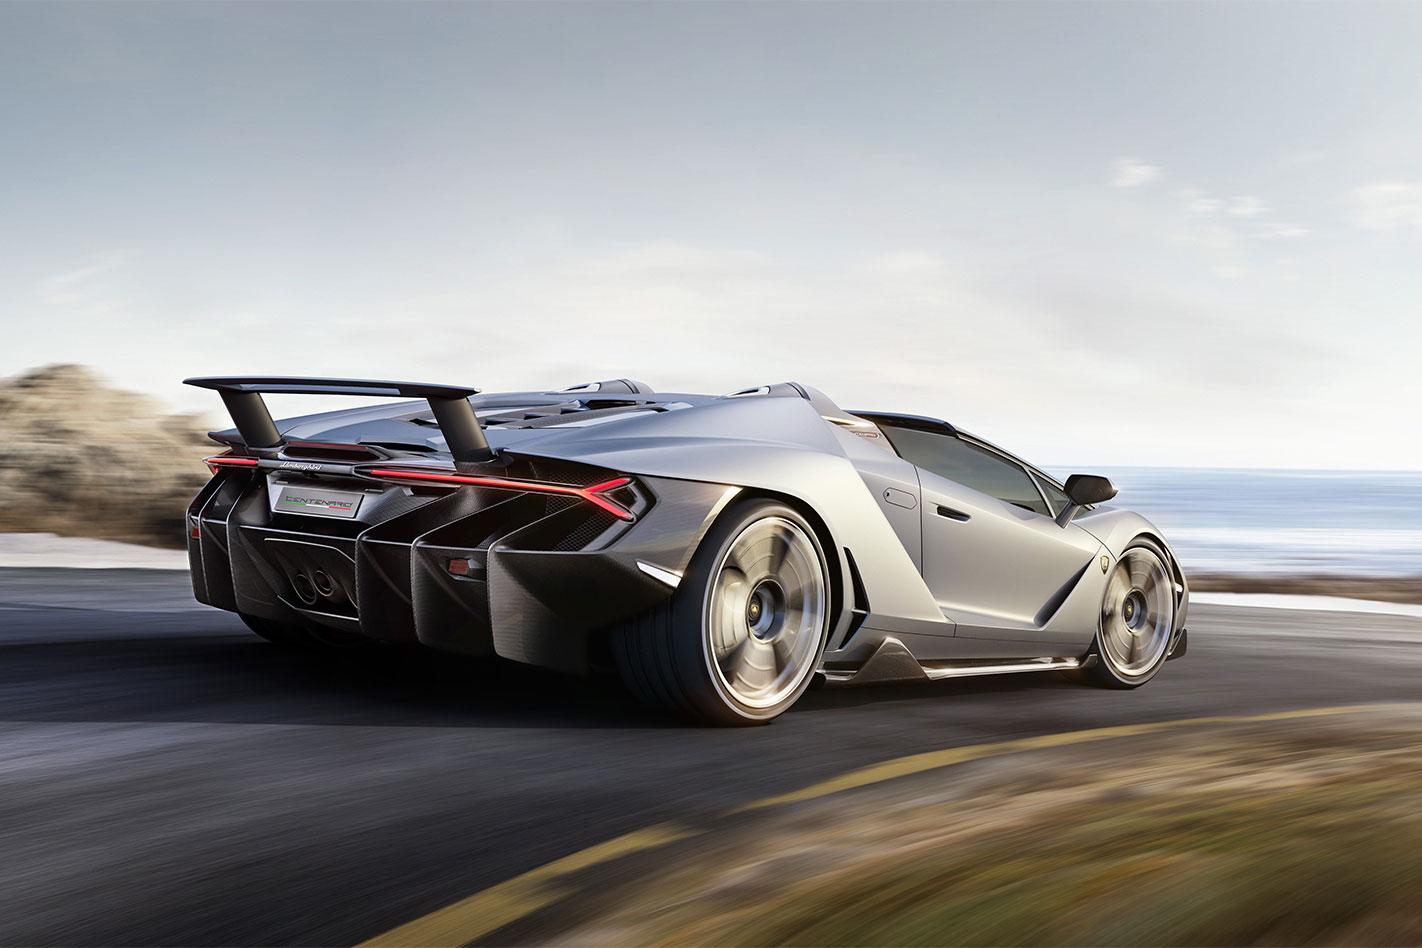 Lamborghini Centenario Roadster rear